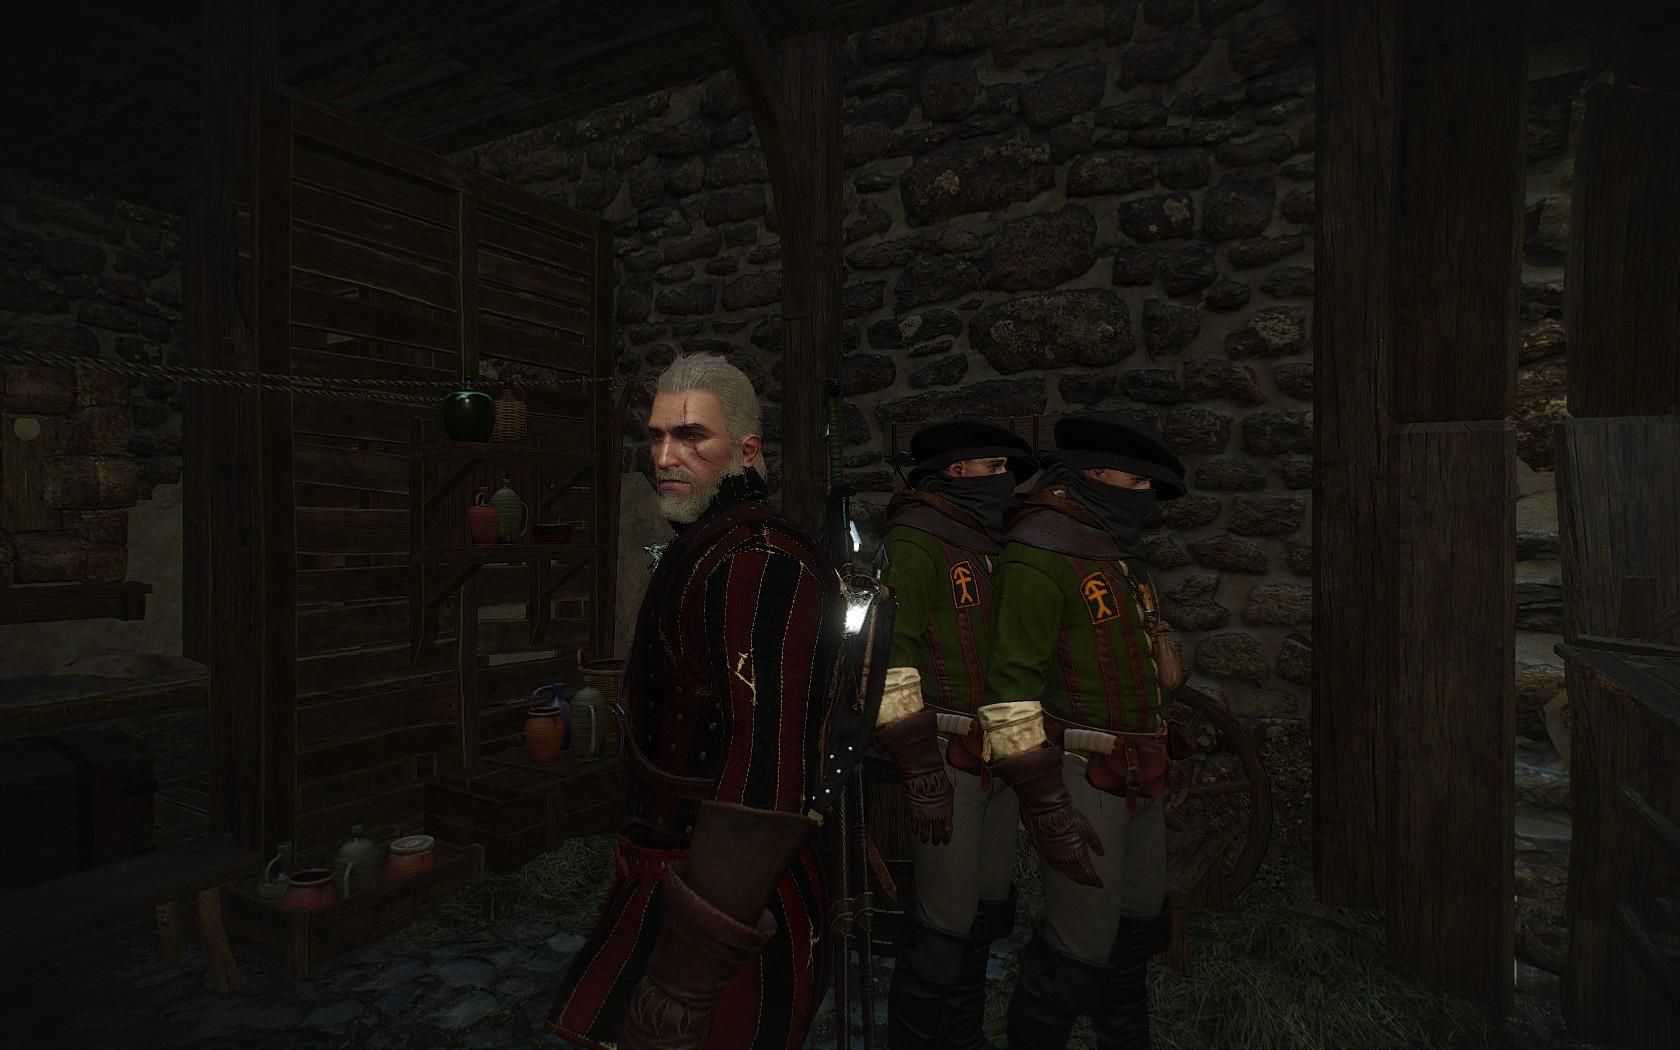 Р - Разнообразие - Witcher 3: Wild Hunt, the близнецы, копия, разнообразие